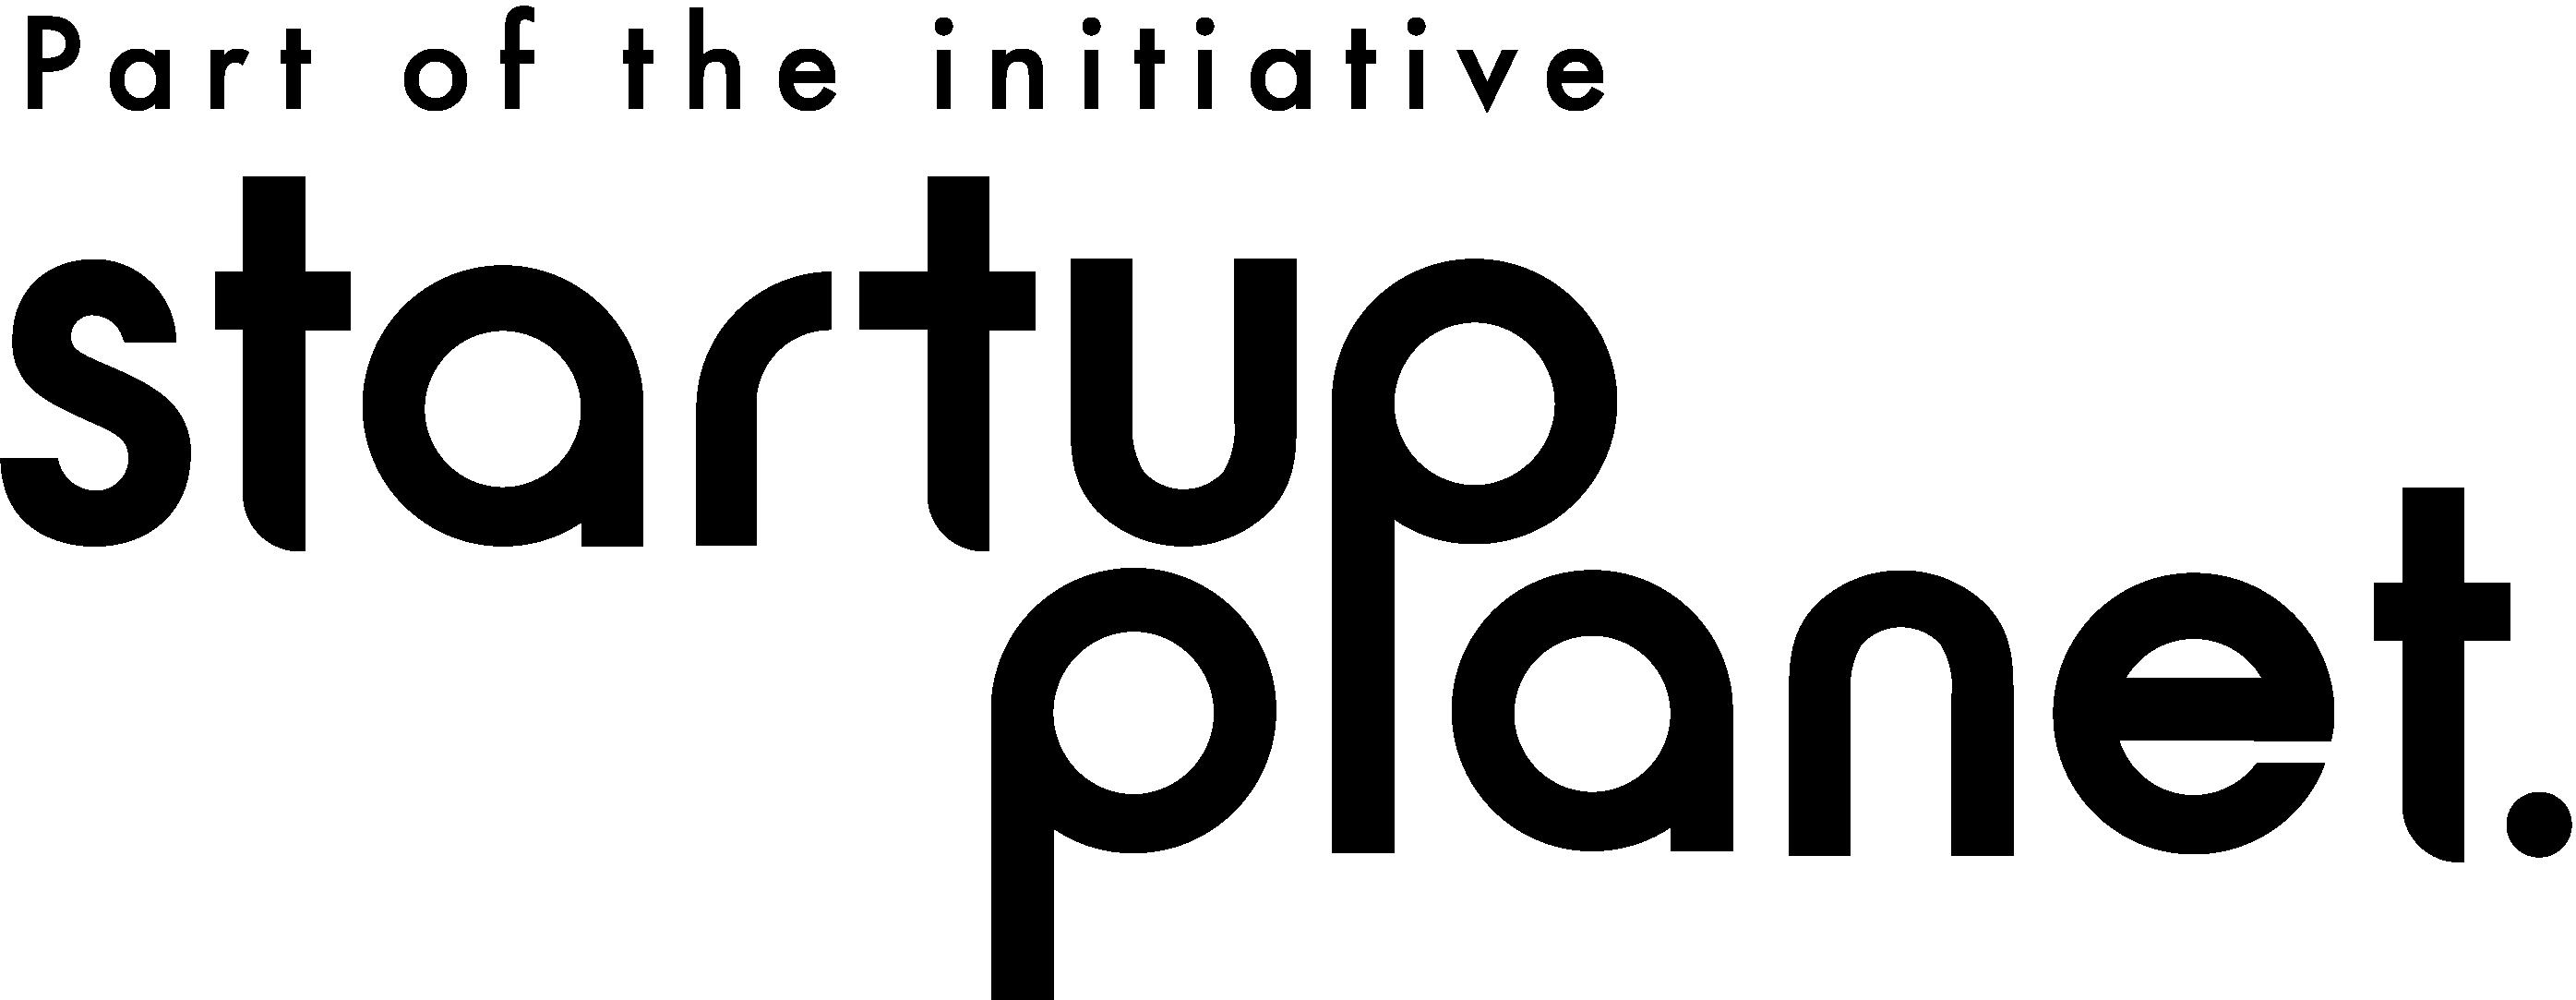 https://startupplanet.dk/themes/startupplanet/images/SUP-3-logo-black.png